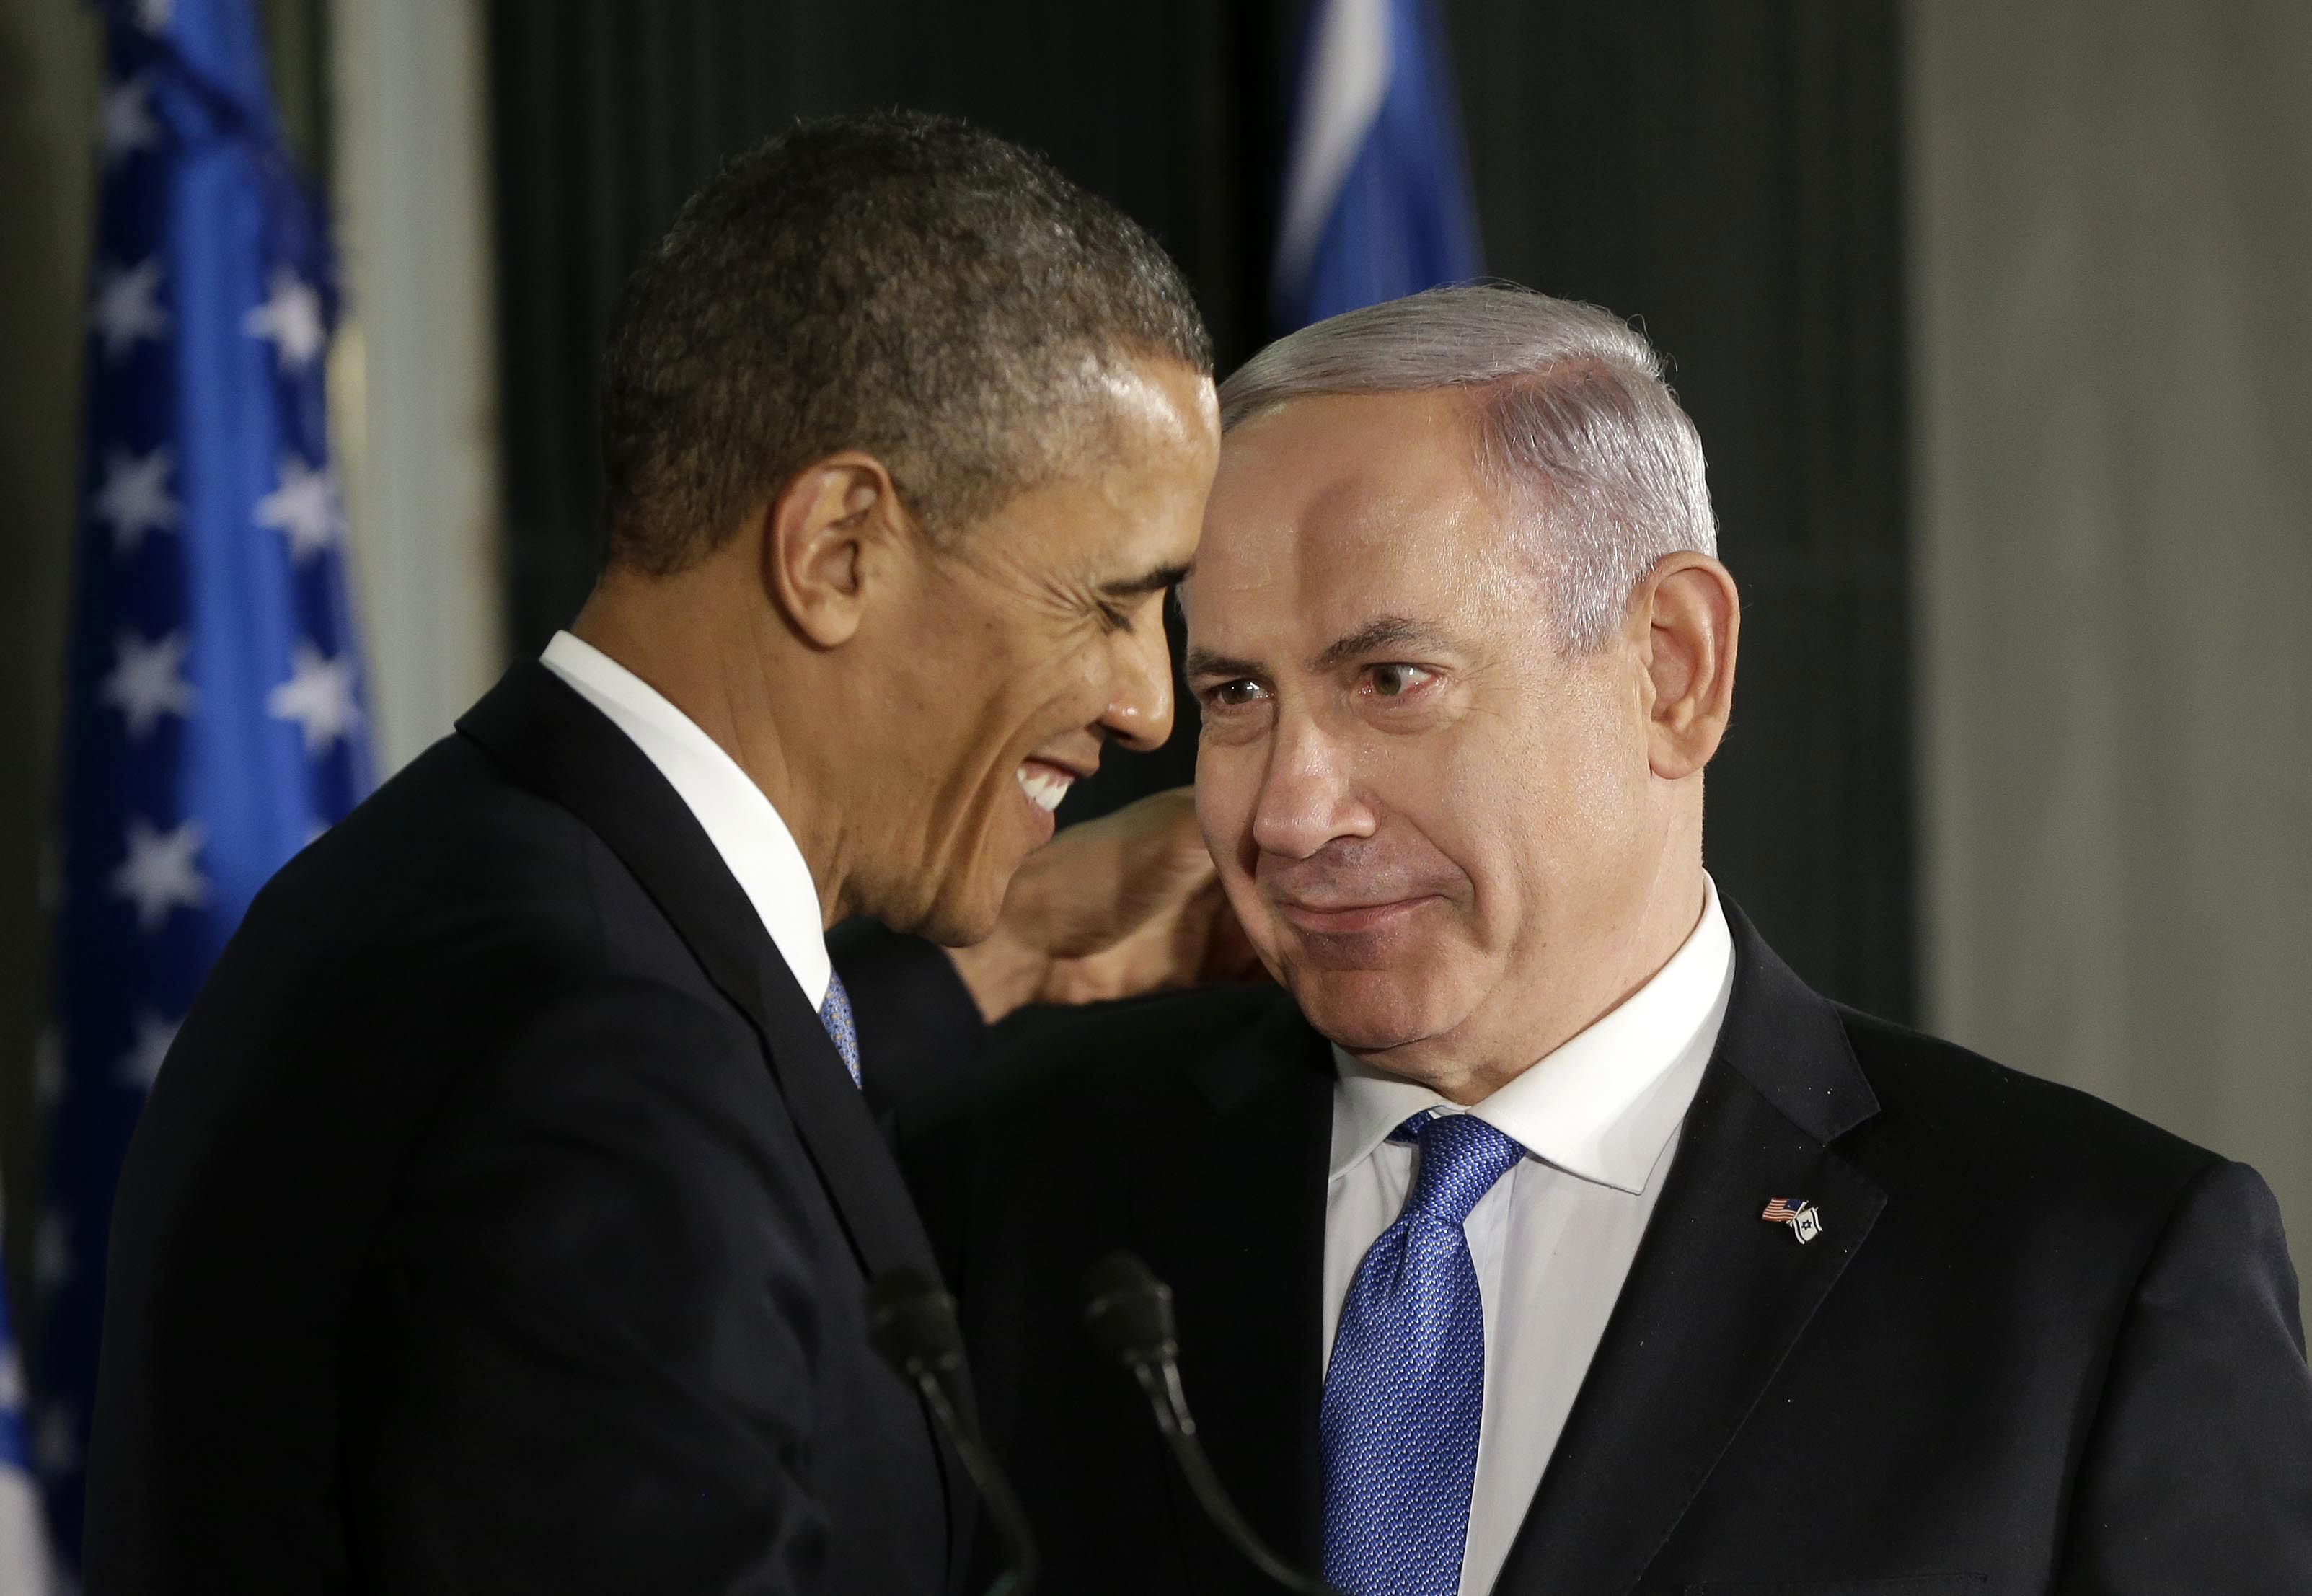 Image: Barack Obama, Benjamin Netanyahu